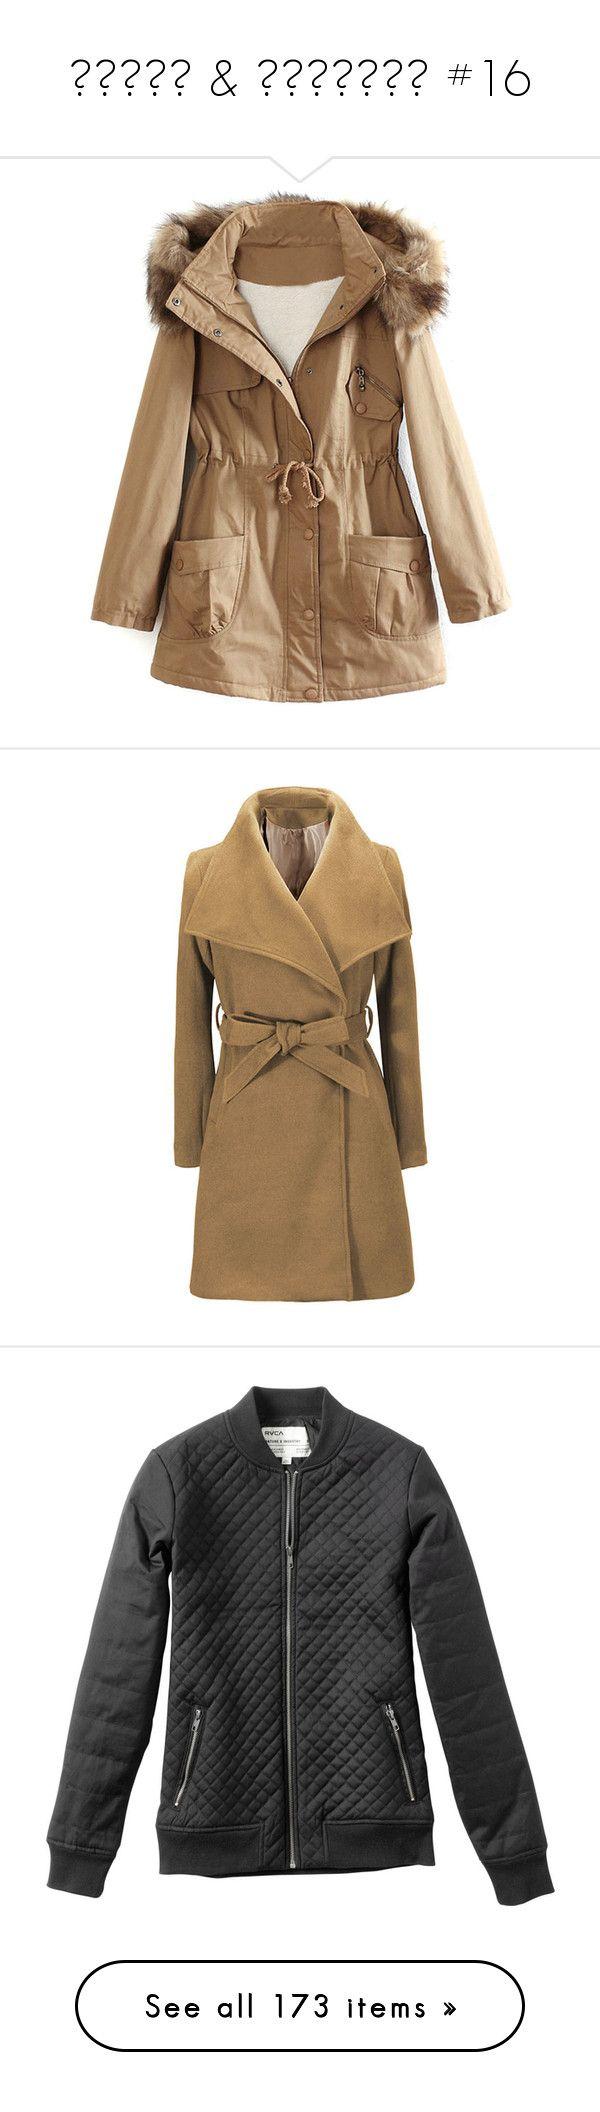 """ϲօɑԵՏ & յɑϲƘҽԵՏ #16"" by booknerd1326 ❤ liked on Polyvore featuring outerwear, coats, jackets, tops, kurtki, brown parka, faux fur hood coat, khaki coat, parka coat and khaki parkas"